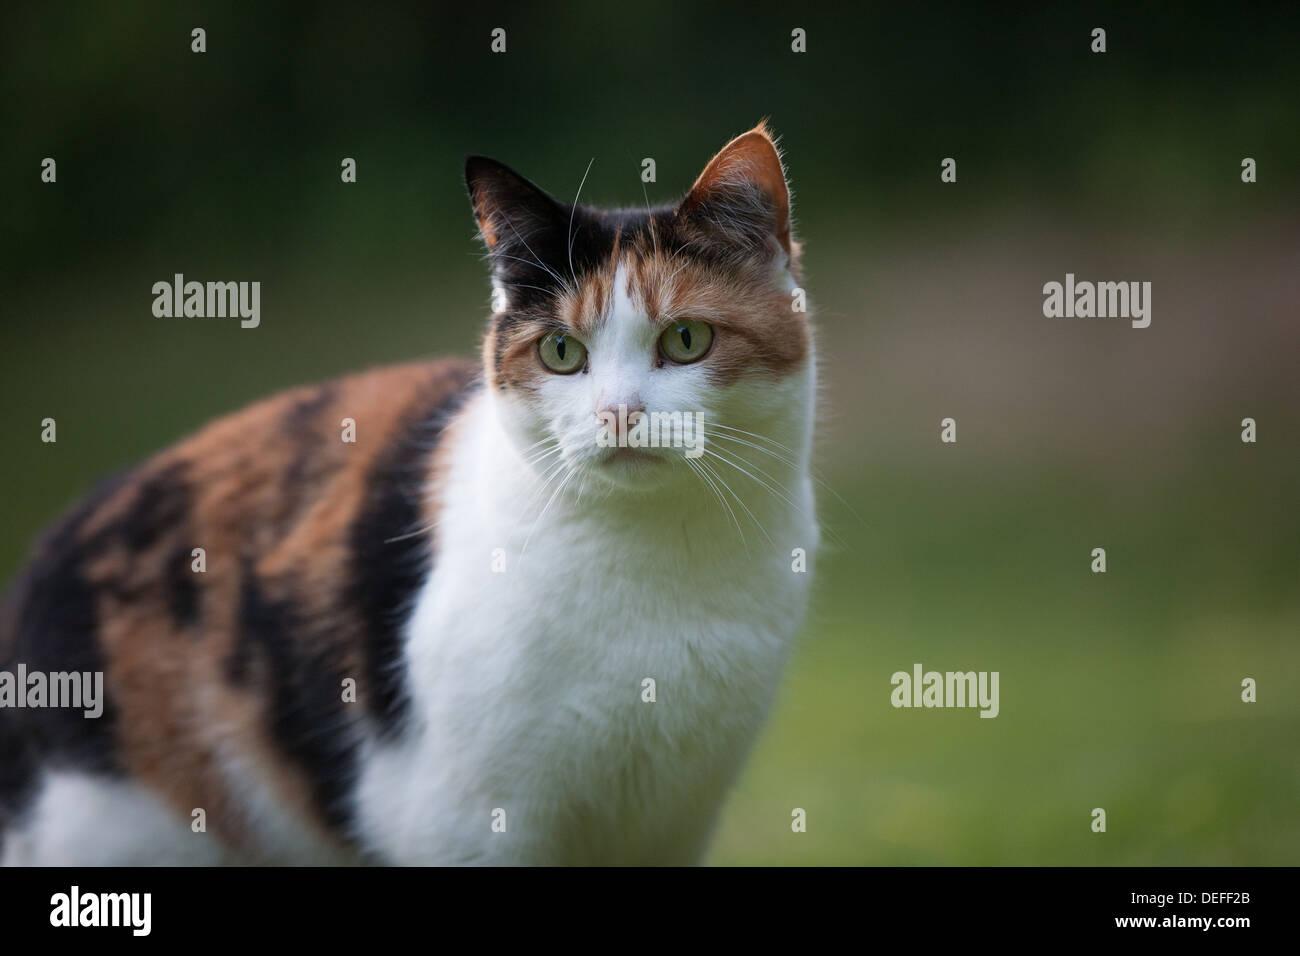 Tortoiseshell domestic shorthaired Cat - Stock Image